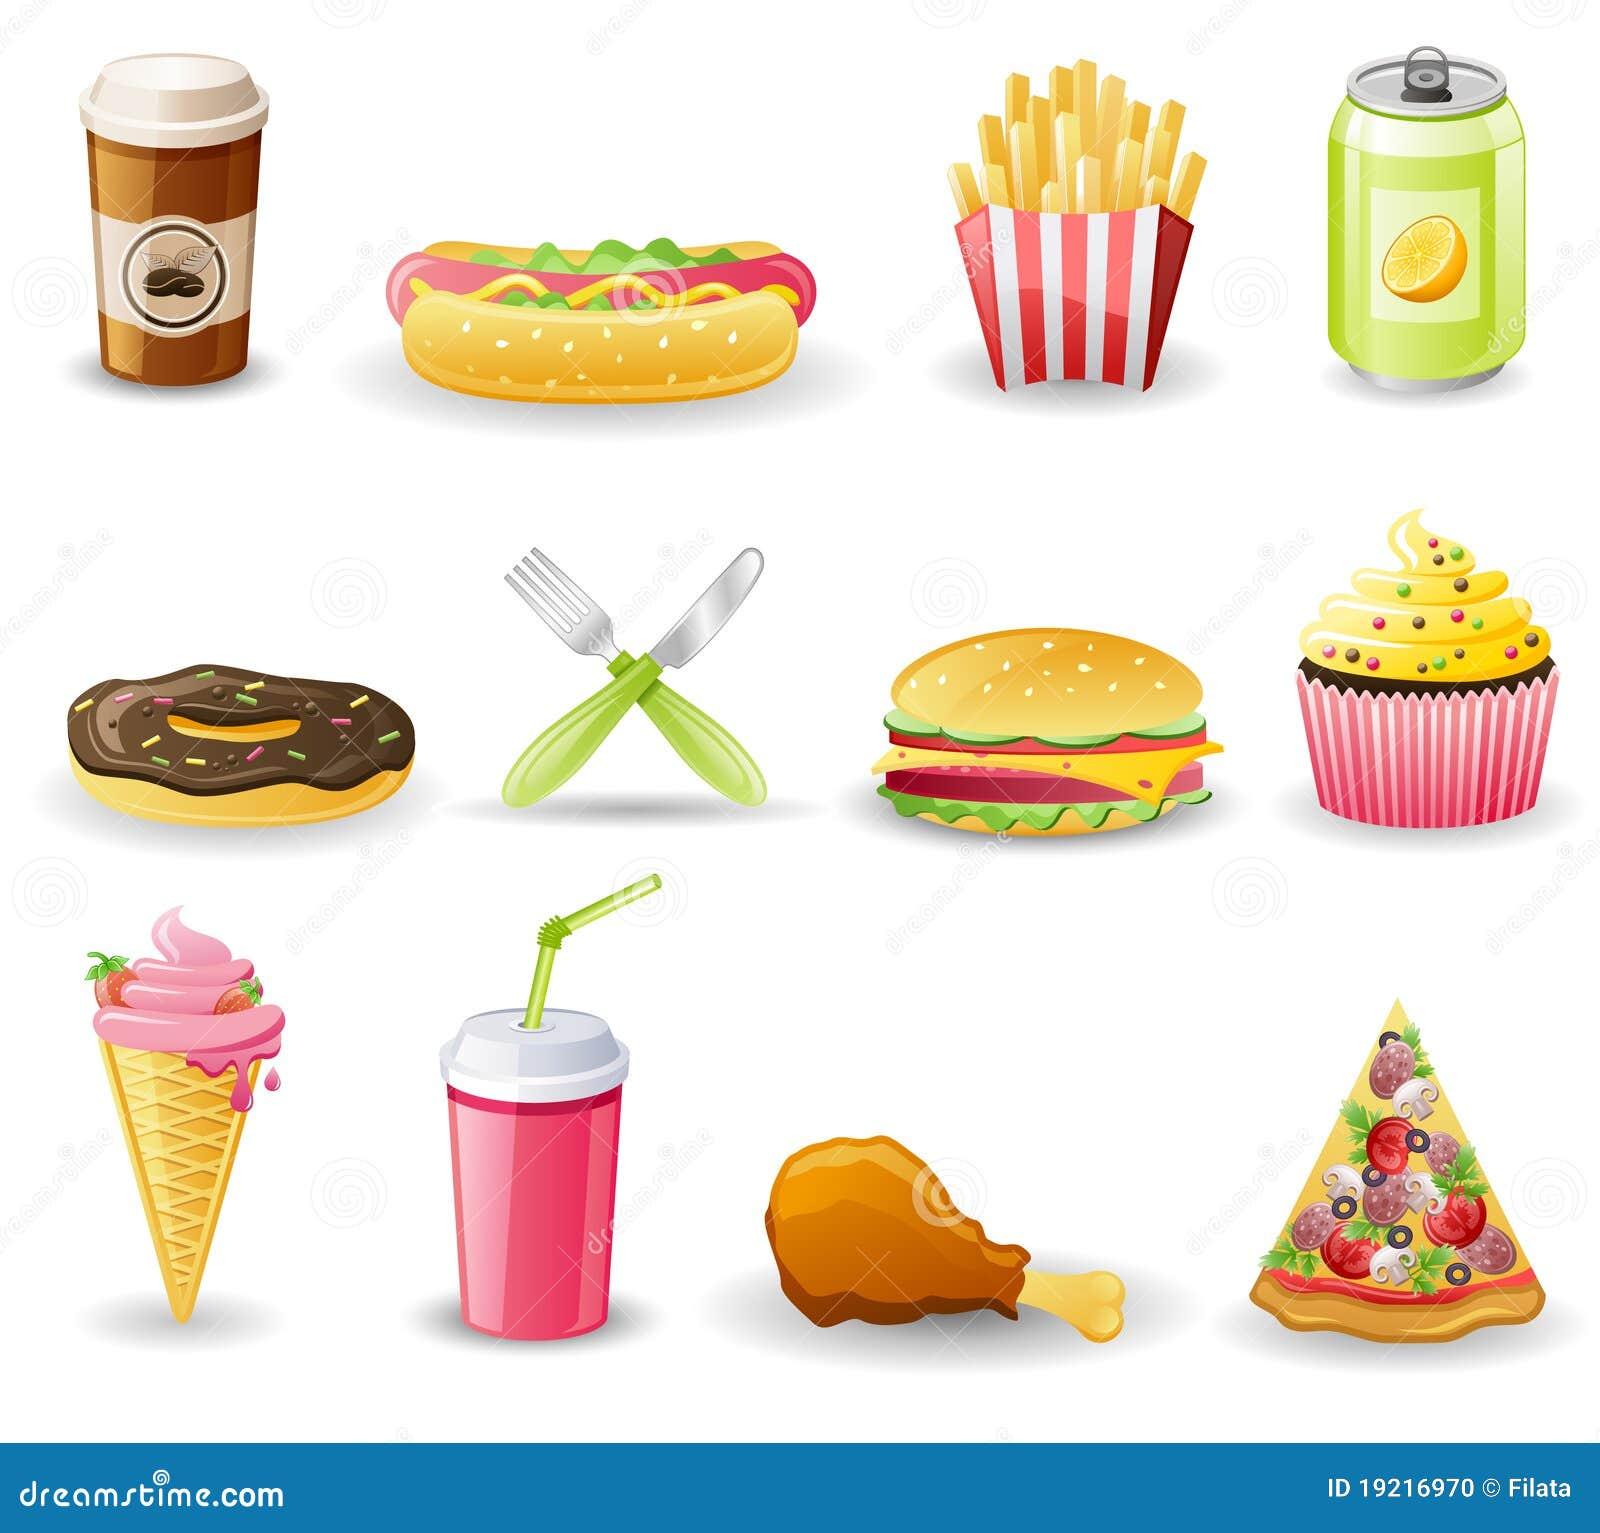 Fast Food Icon Set. Stock Photo - Image: 19216970